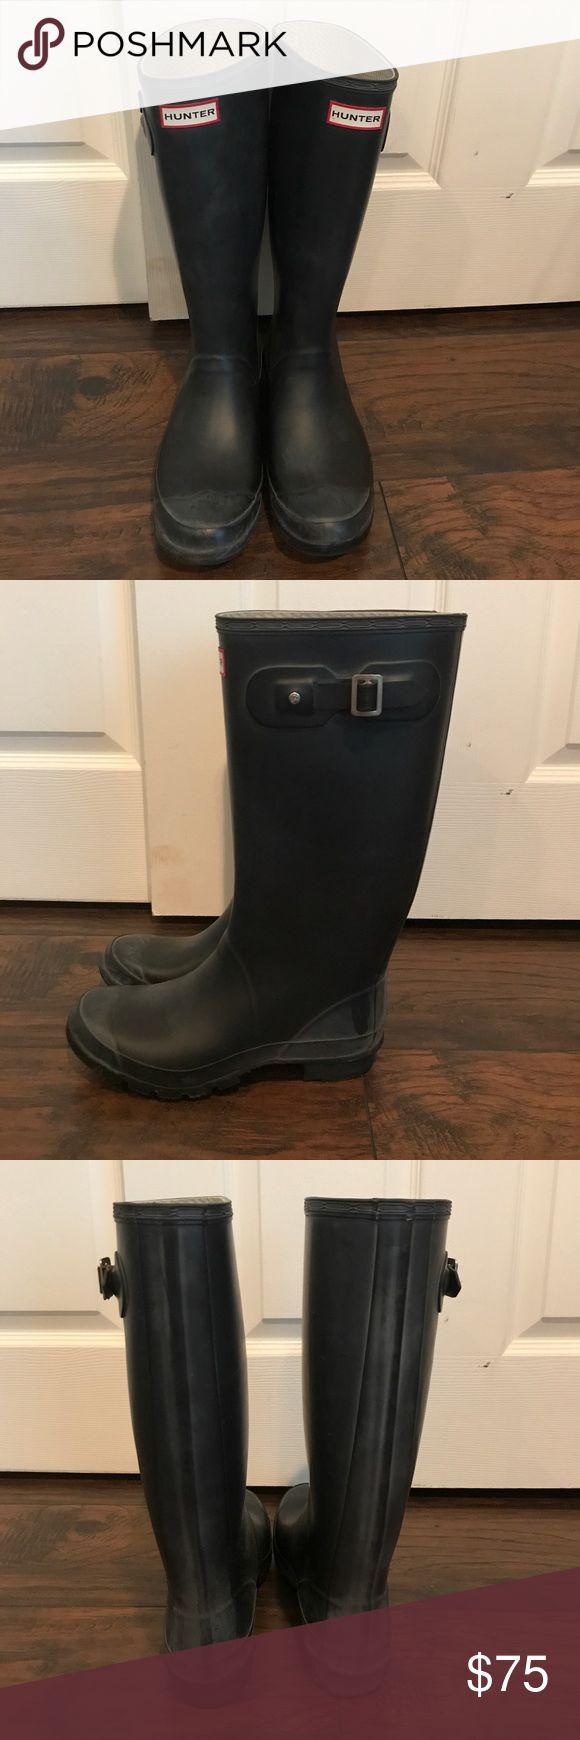 Hunter Rain Boots Matte black Hunter rain boots, huntress (wide calf) Hunter Boots Shoes Winter & Rain Boots